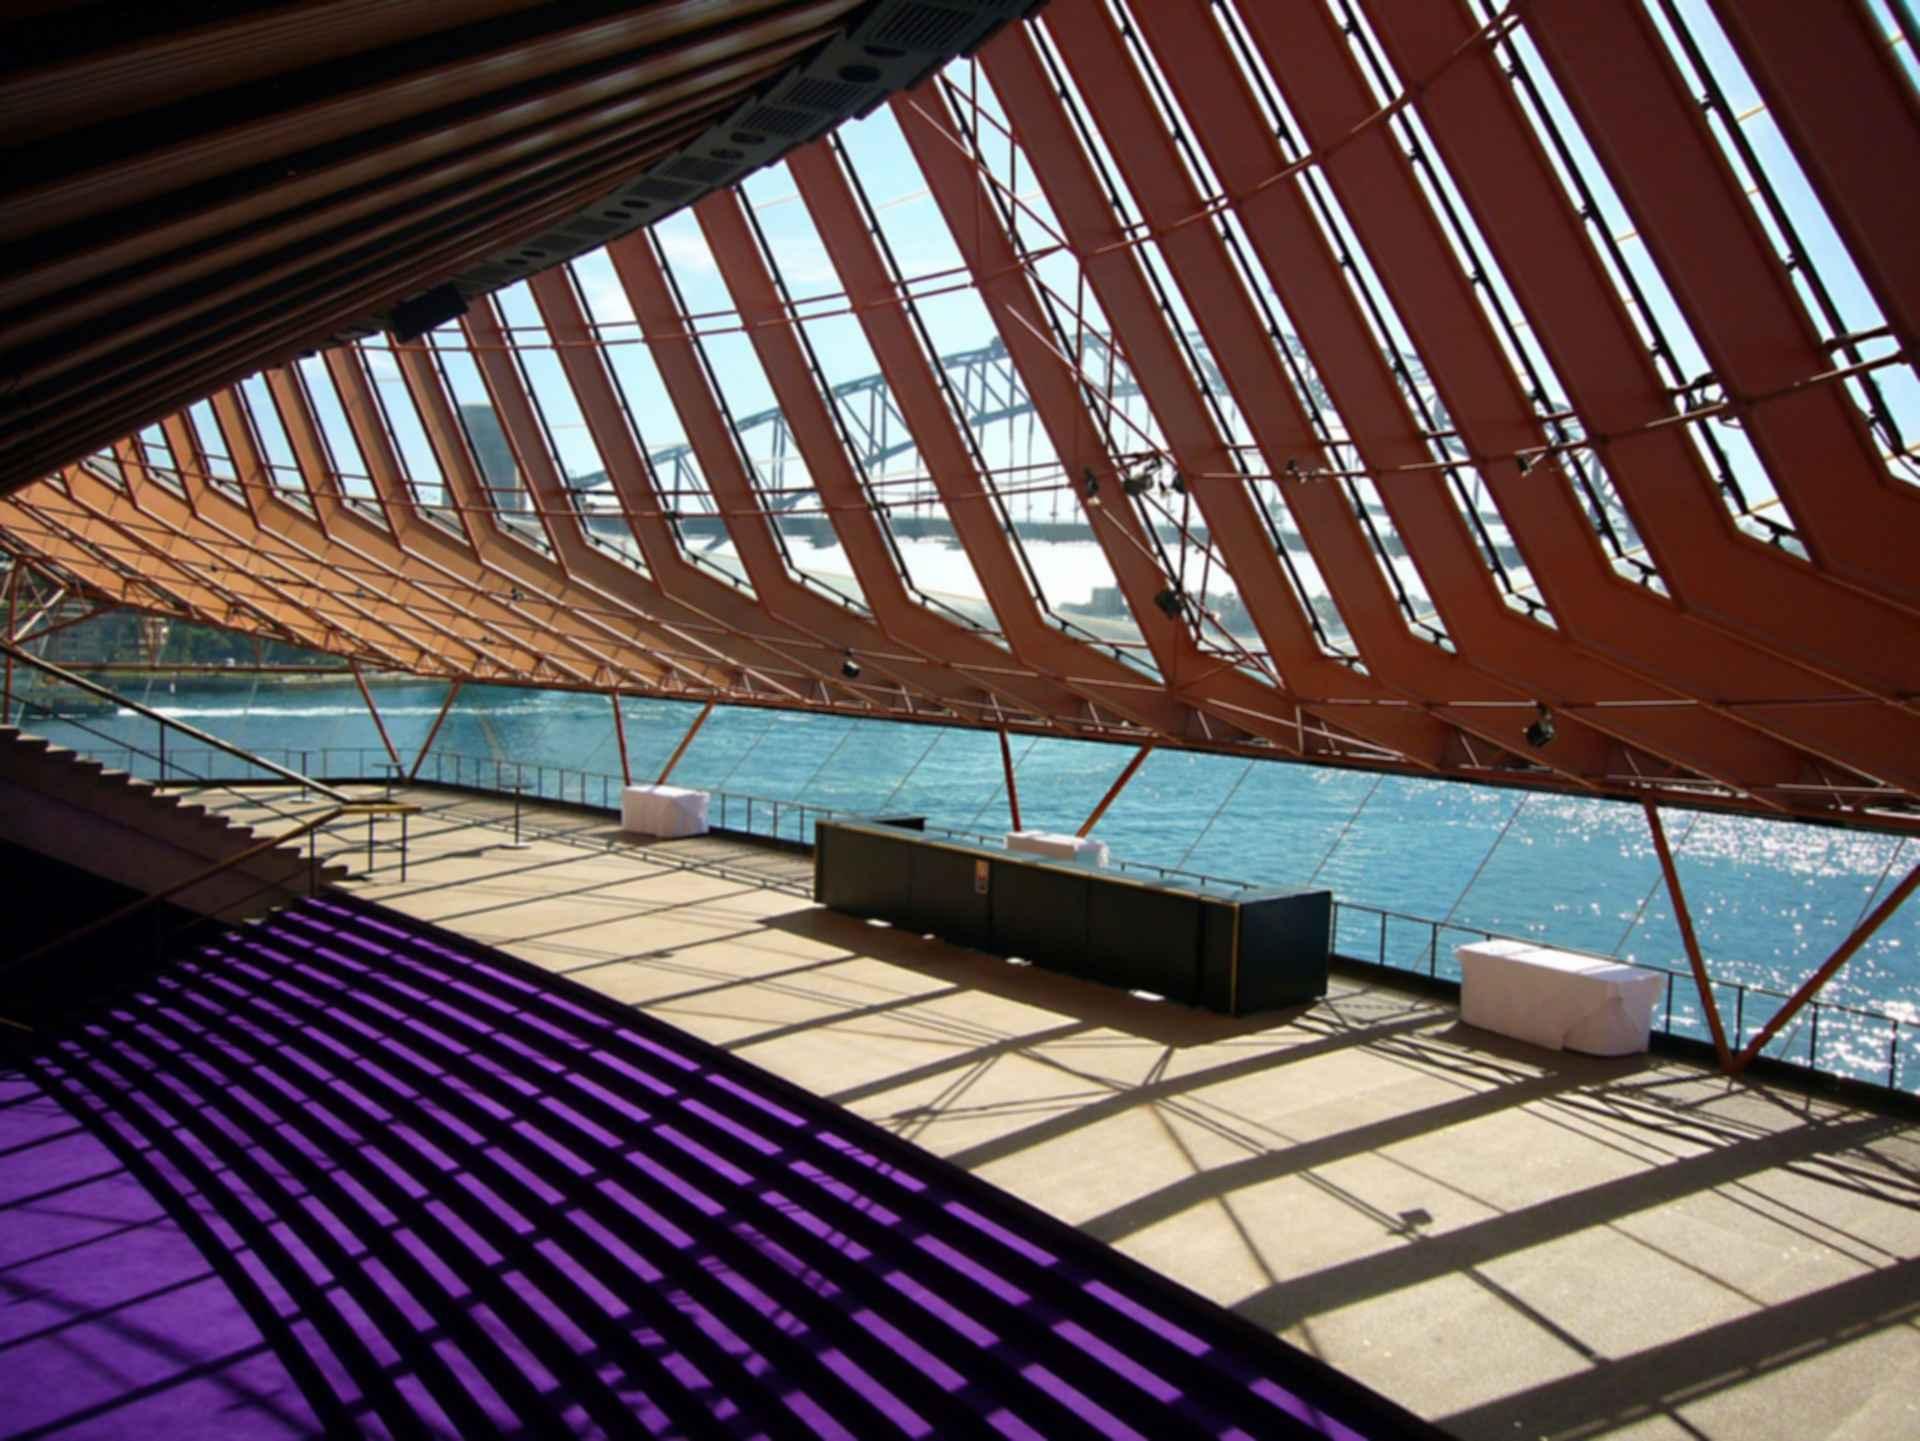 Sydney Opera House - Interior